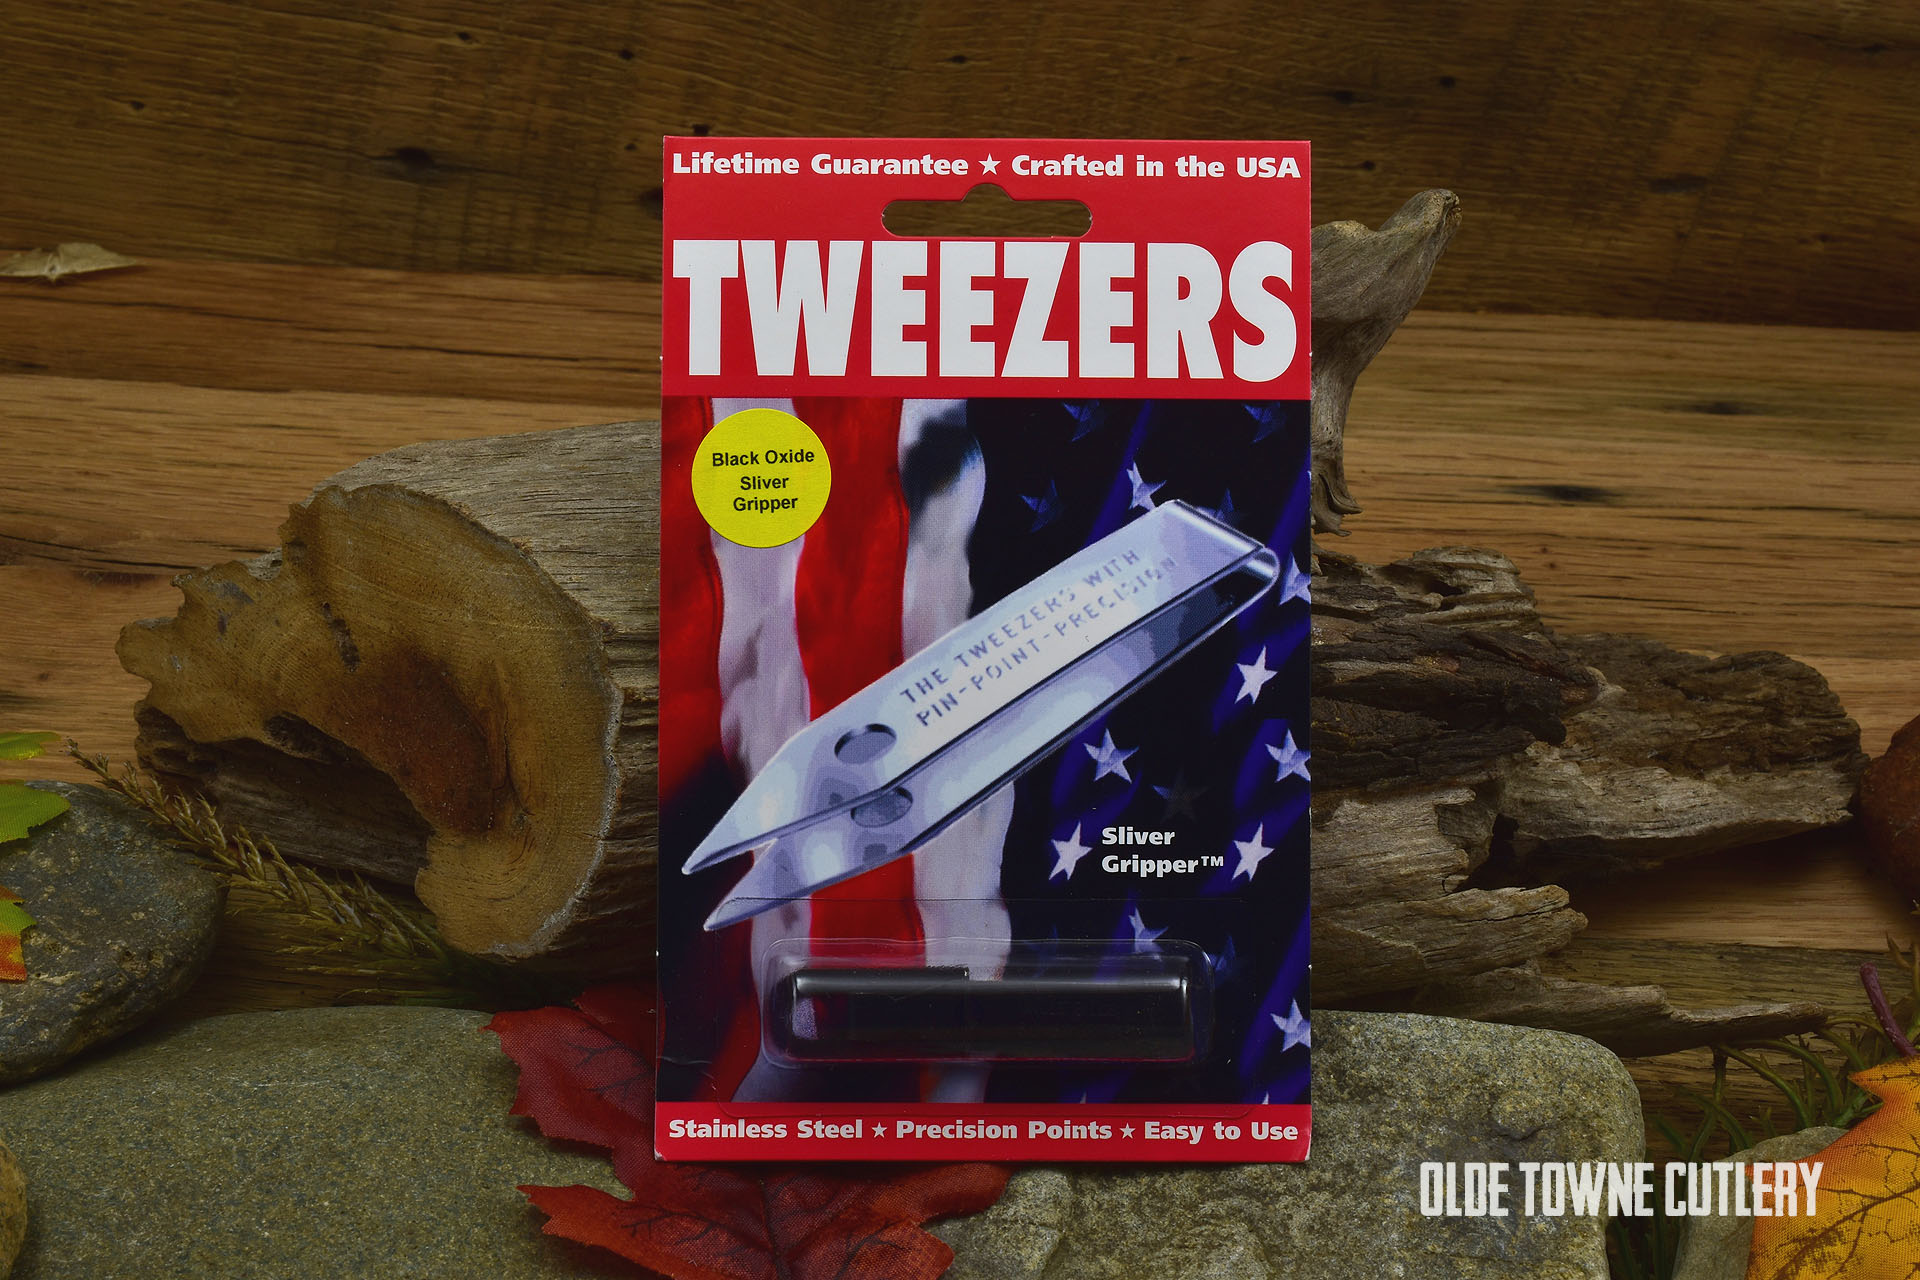 Sliver Gripper SGR601BLOX Precision Tweezers